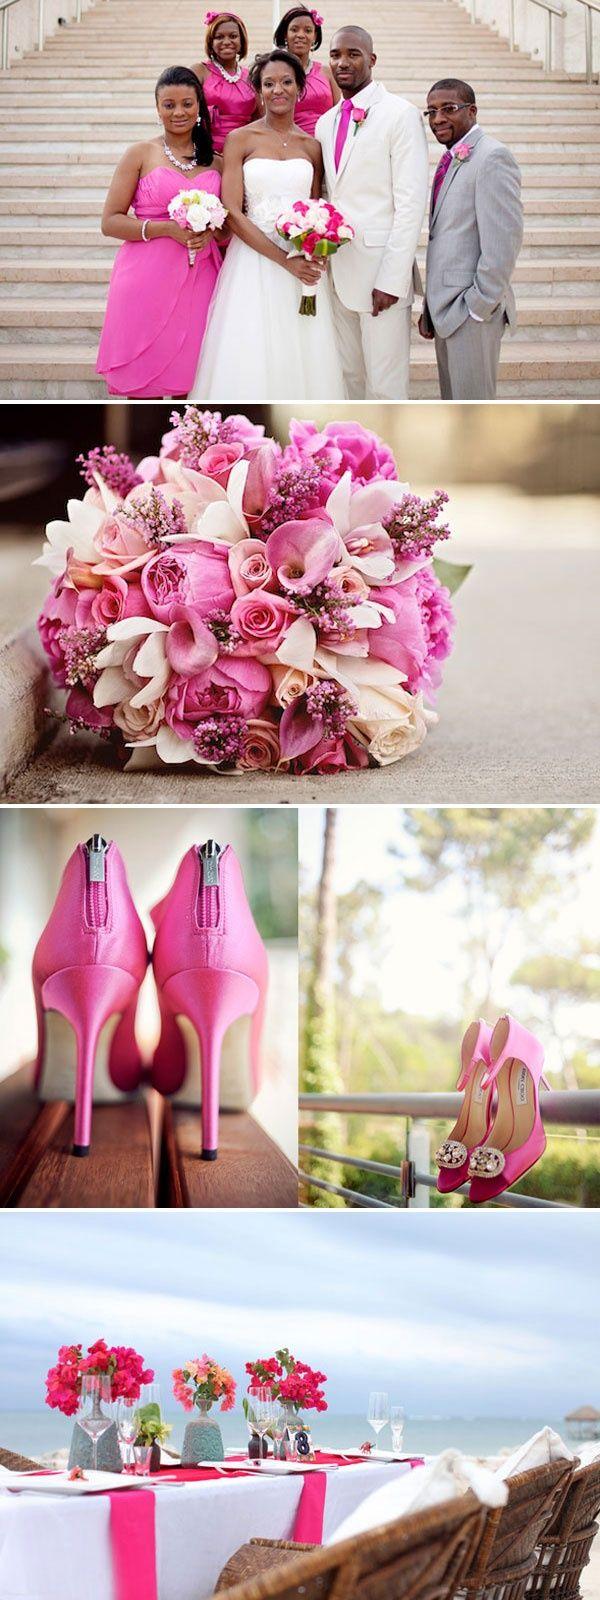 pink wedding ideas #hot #pink #decorations | Wedding | Pinterest ...